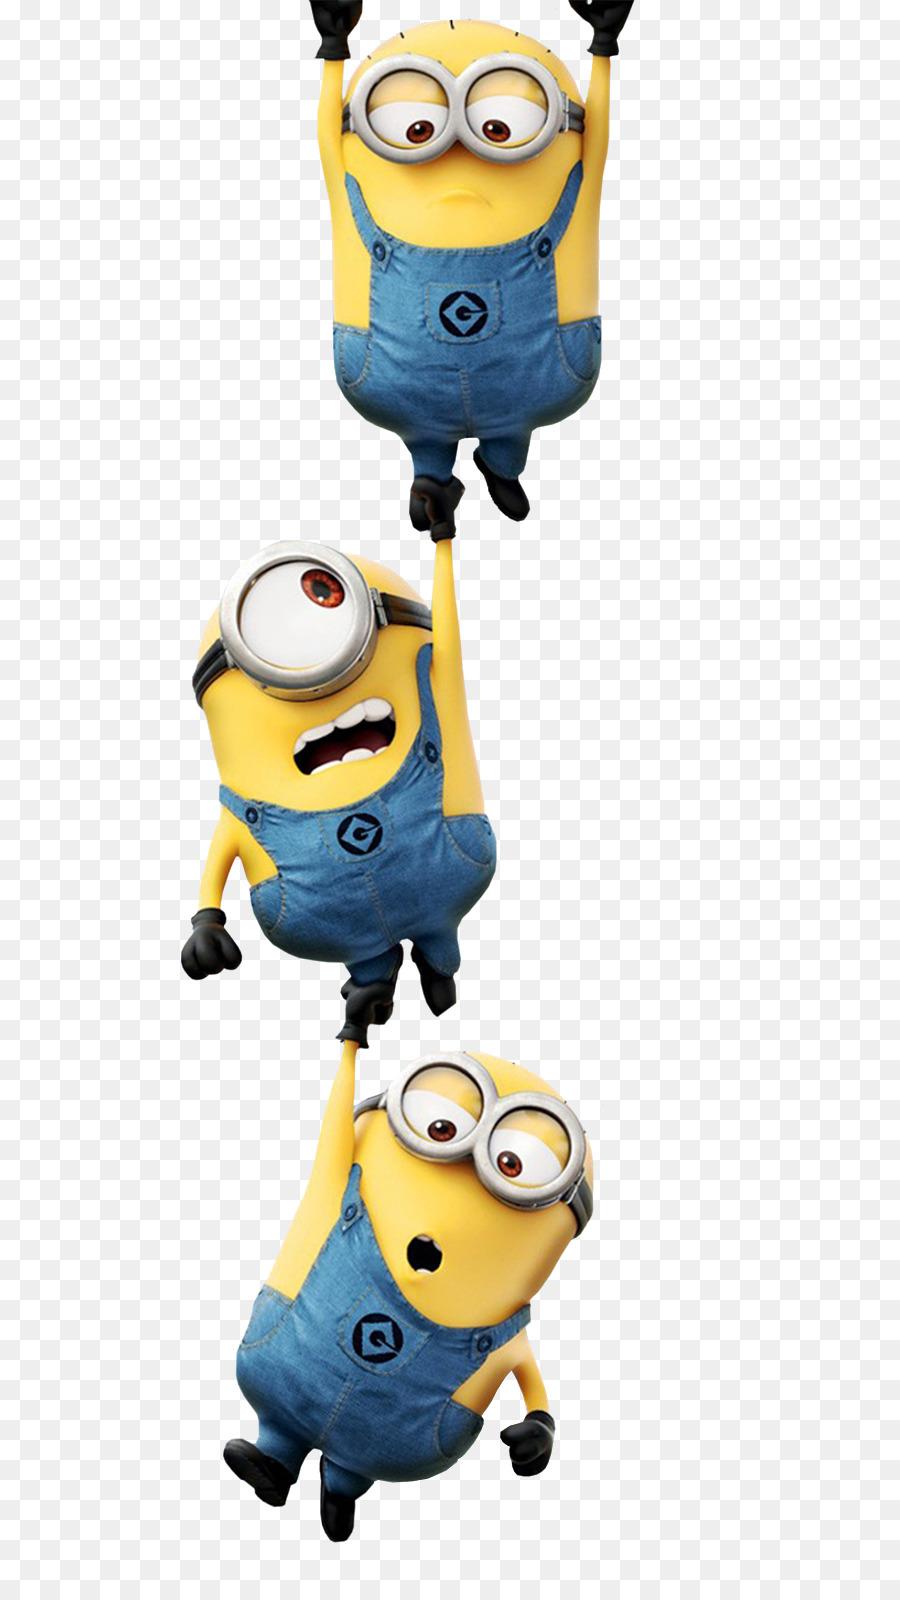 Stuart The Minion Minions Desktop Wallpaper Iphone Minnions Png